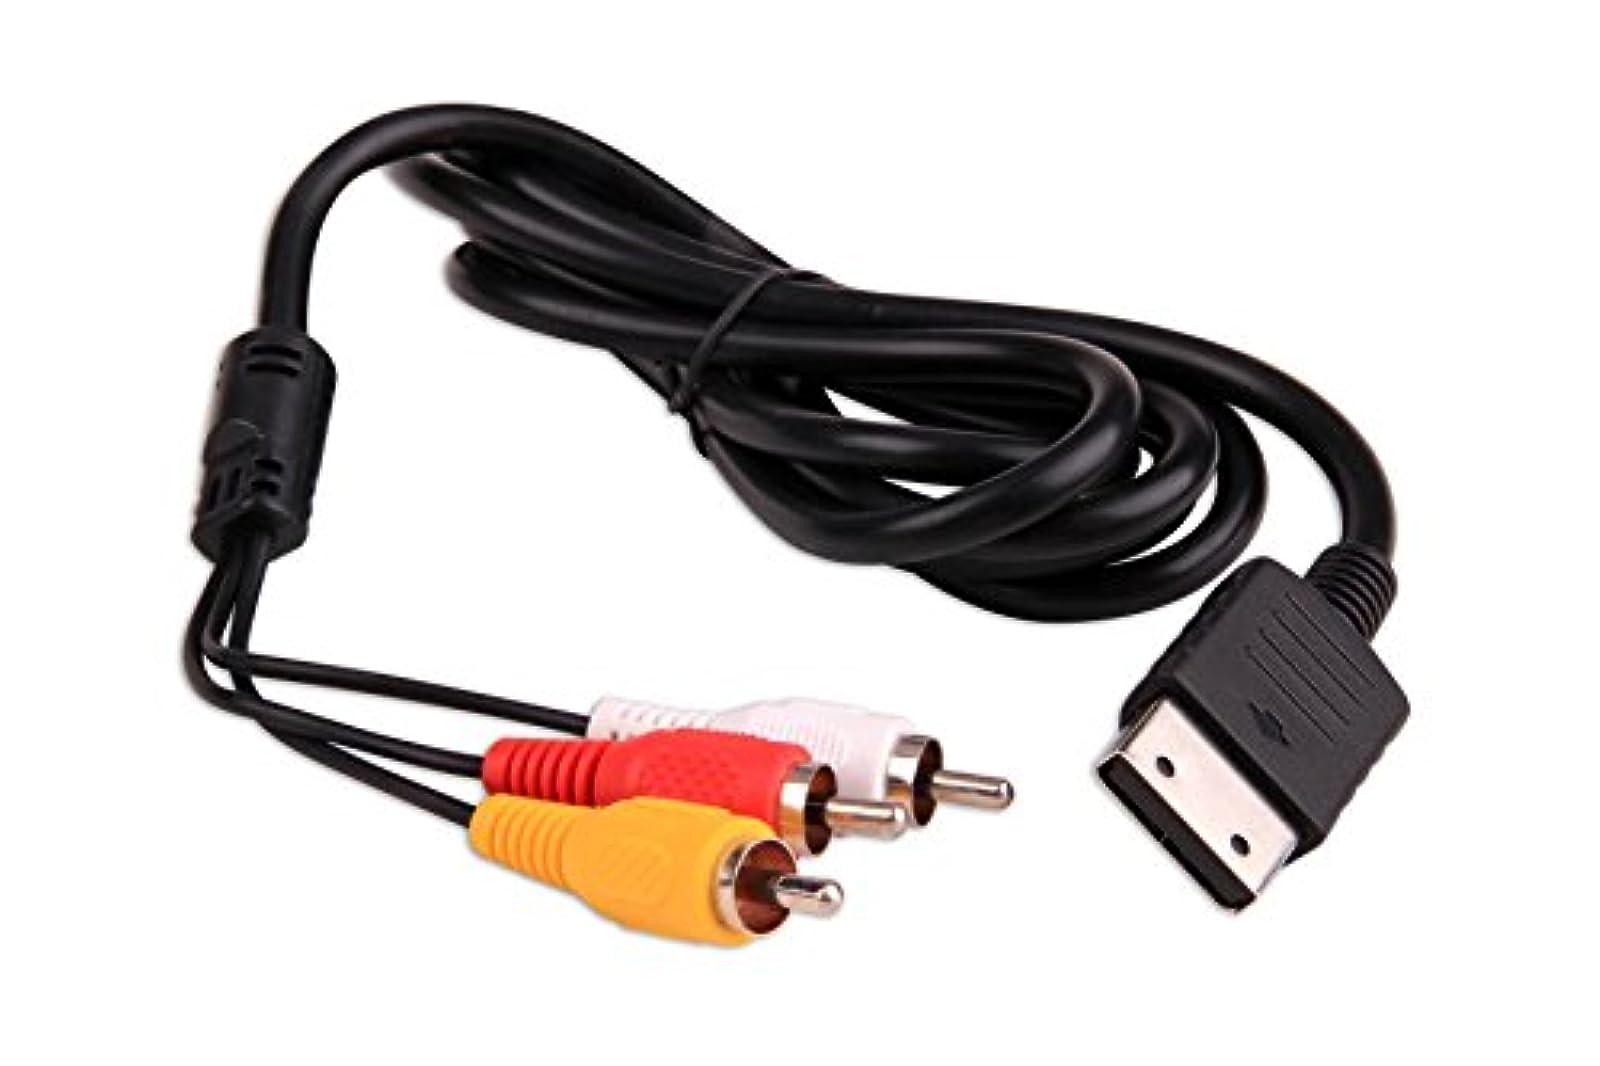 Composite AV Cable For Sega DreamCast By Mars Devices A/V